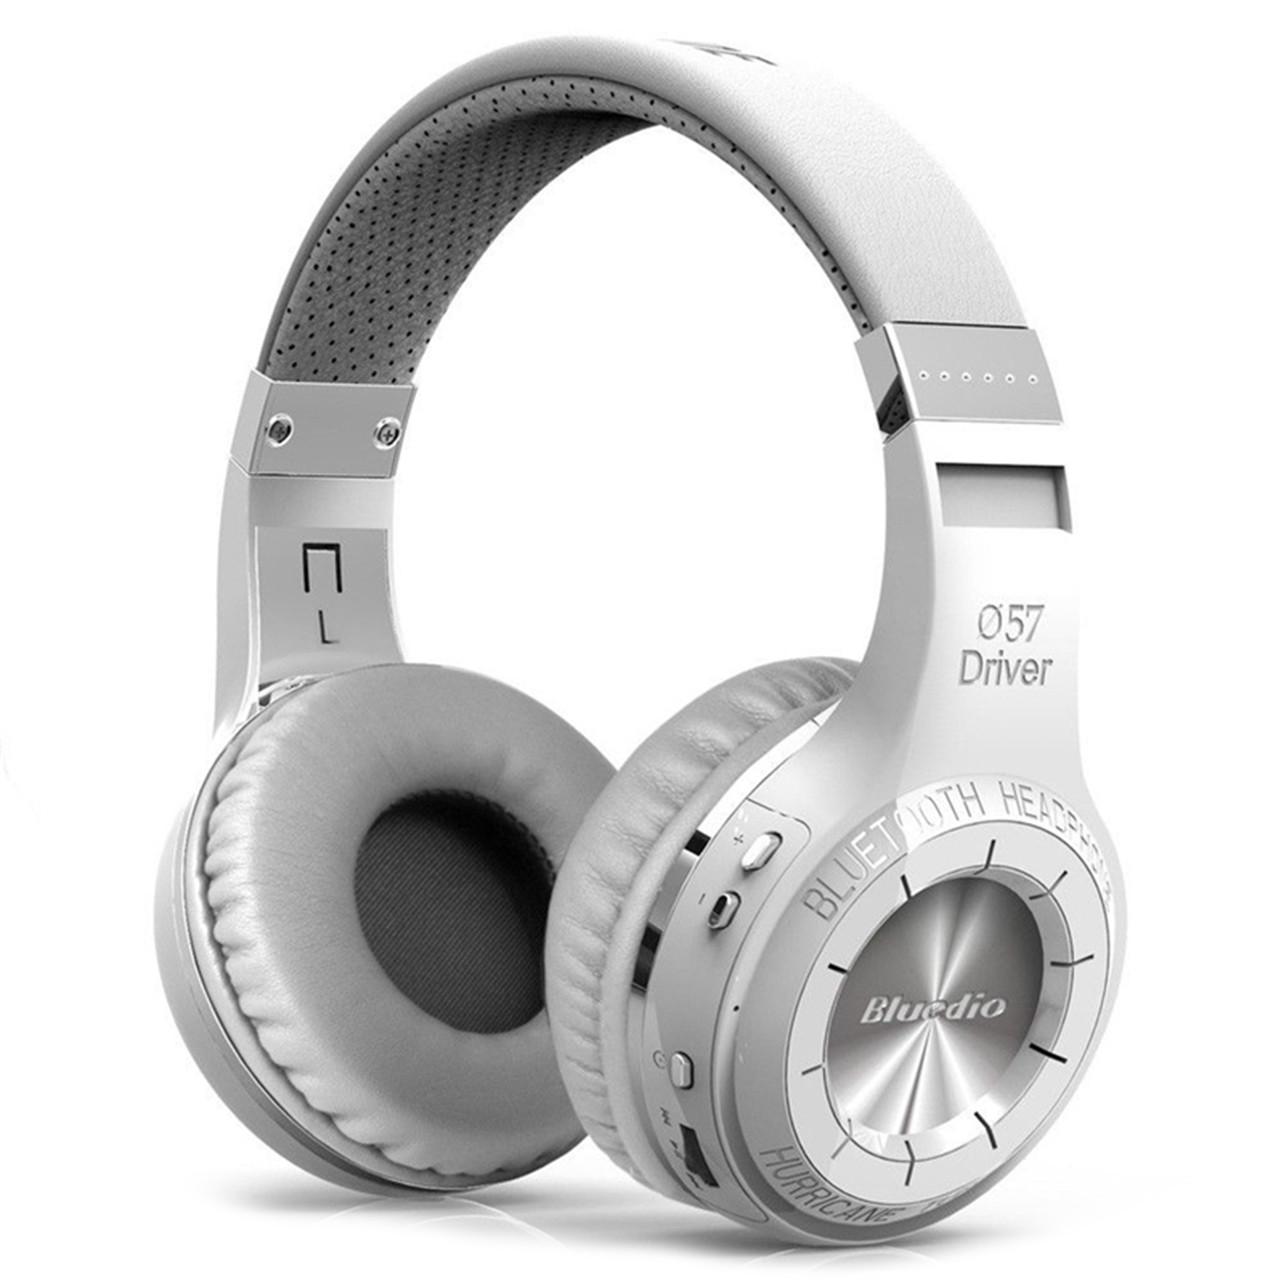 ★Bluetooth гарнитура Bluedio H+ White microSD Радио беспроводная с микрофоном для смартфона и планшета